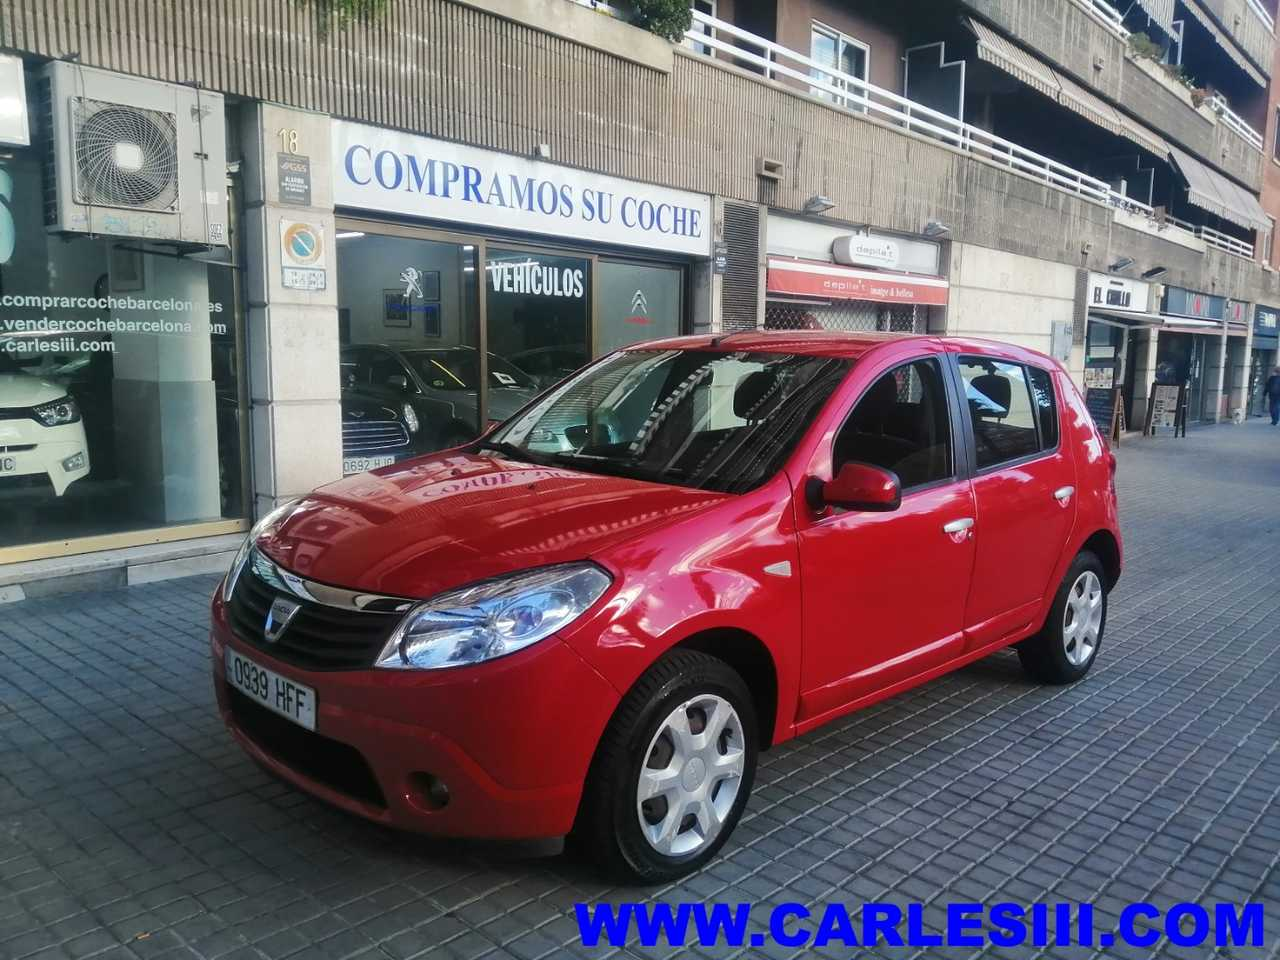 Dacia Sandero Laureate 1.2 16v 75cv E5   - Foto 1